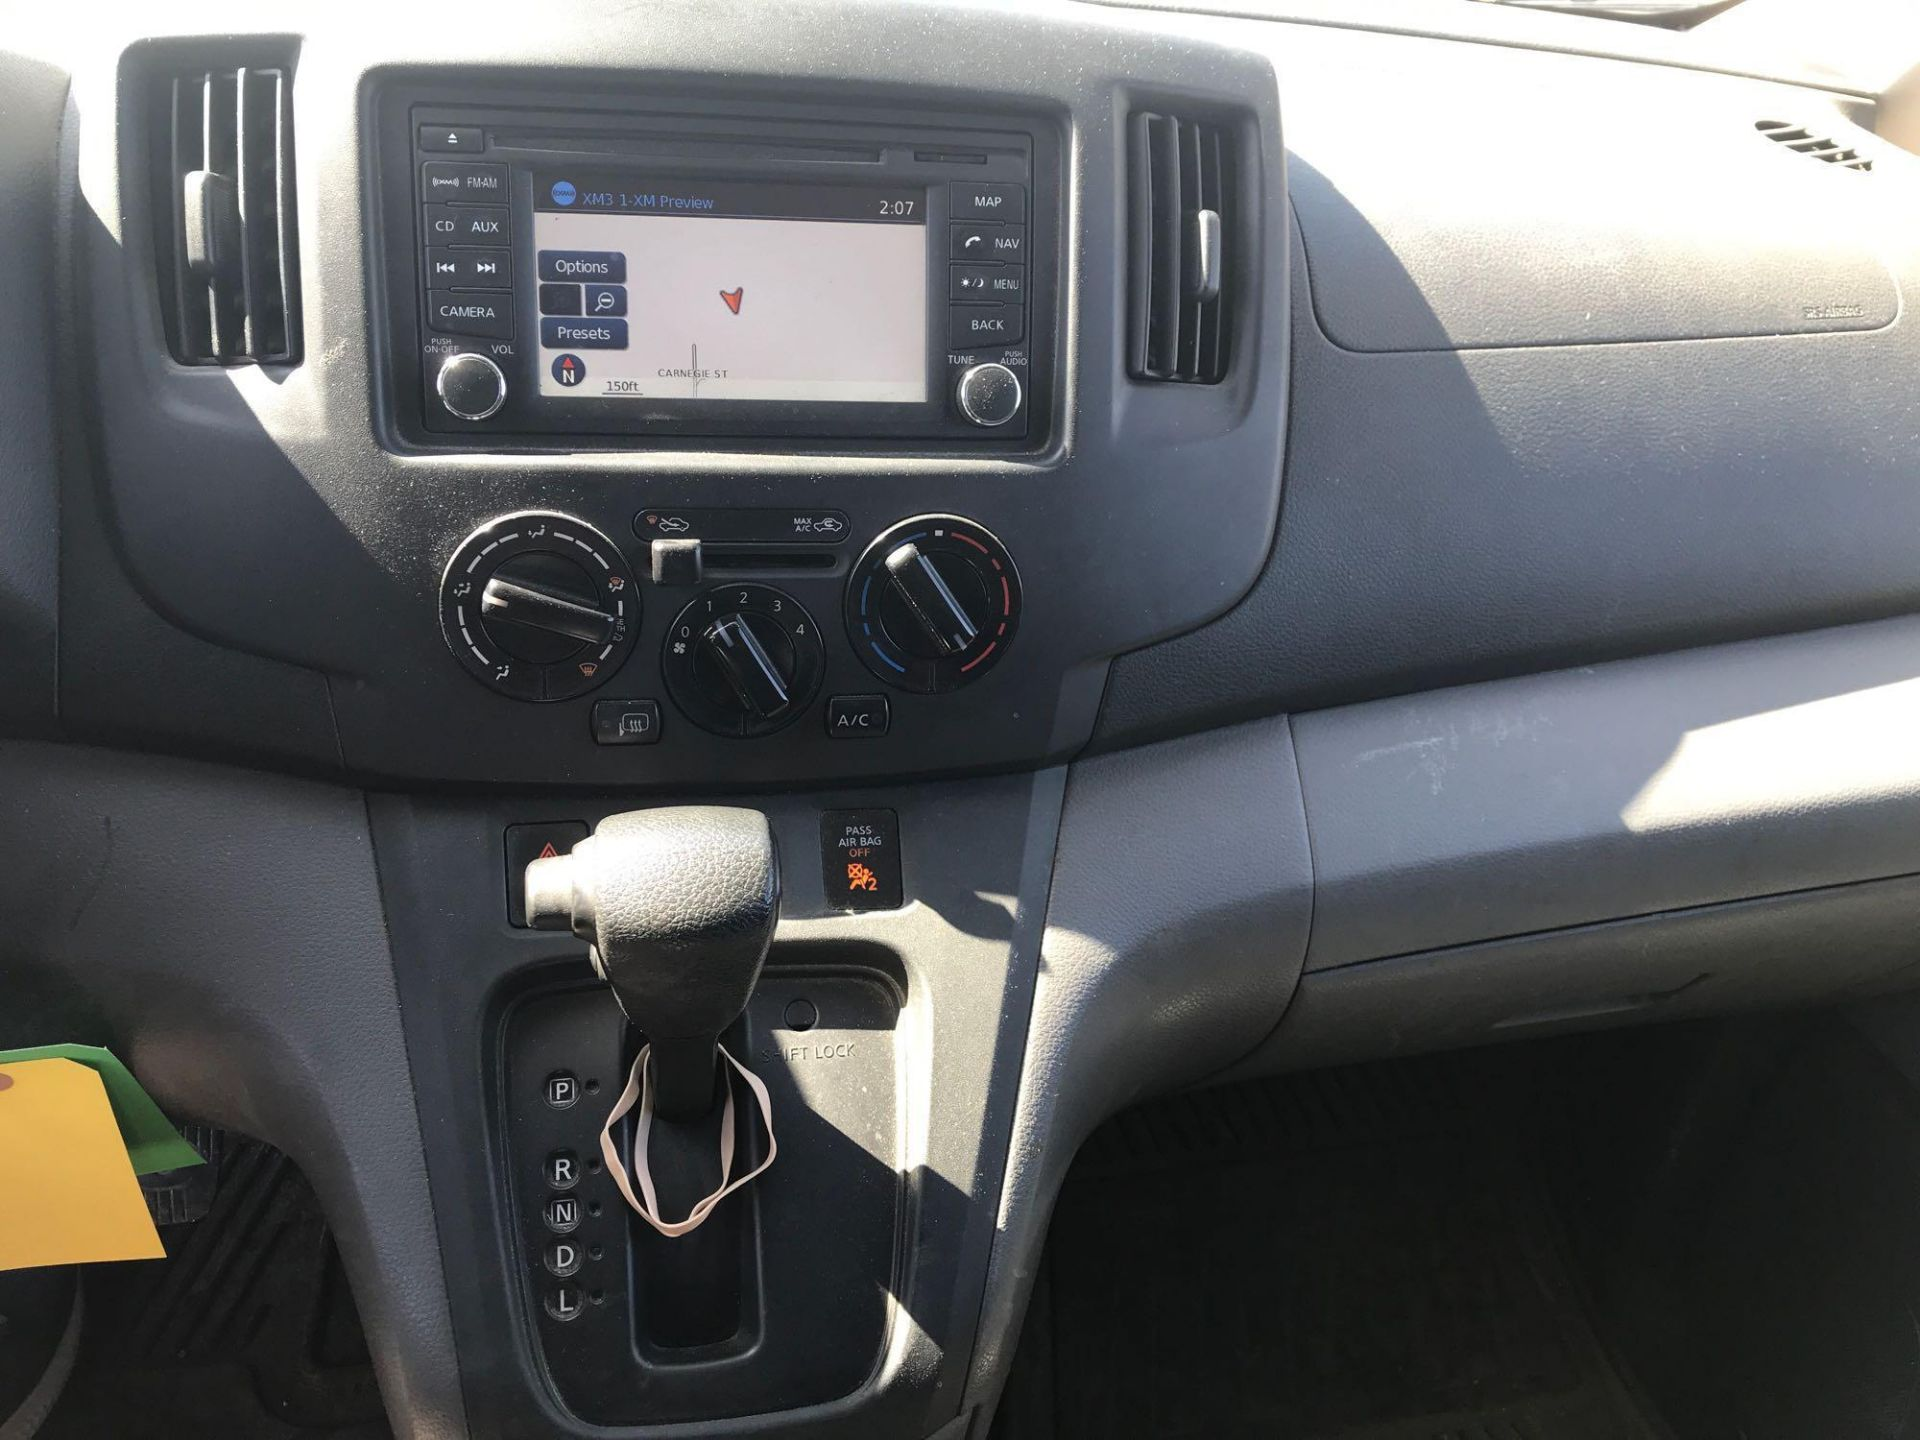 2013 Nissan NV200 Delivery Van - Image 5 of 54